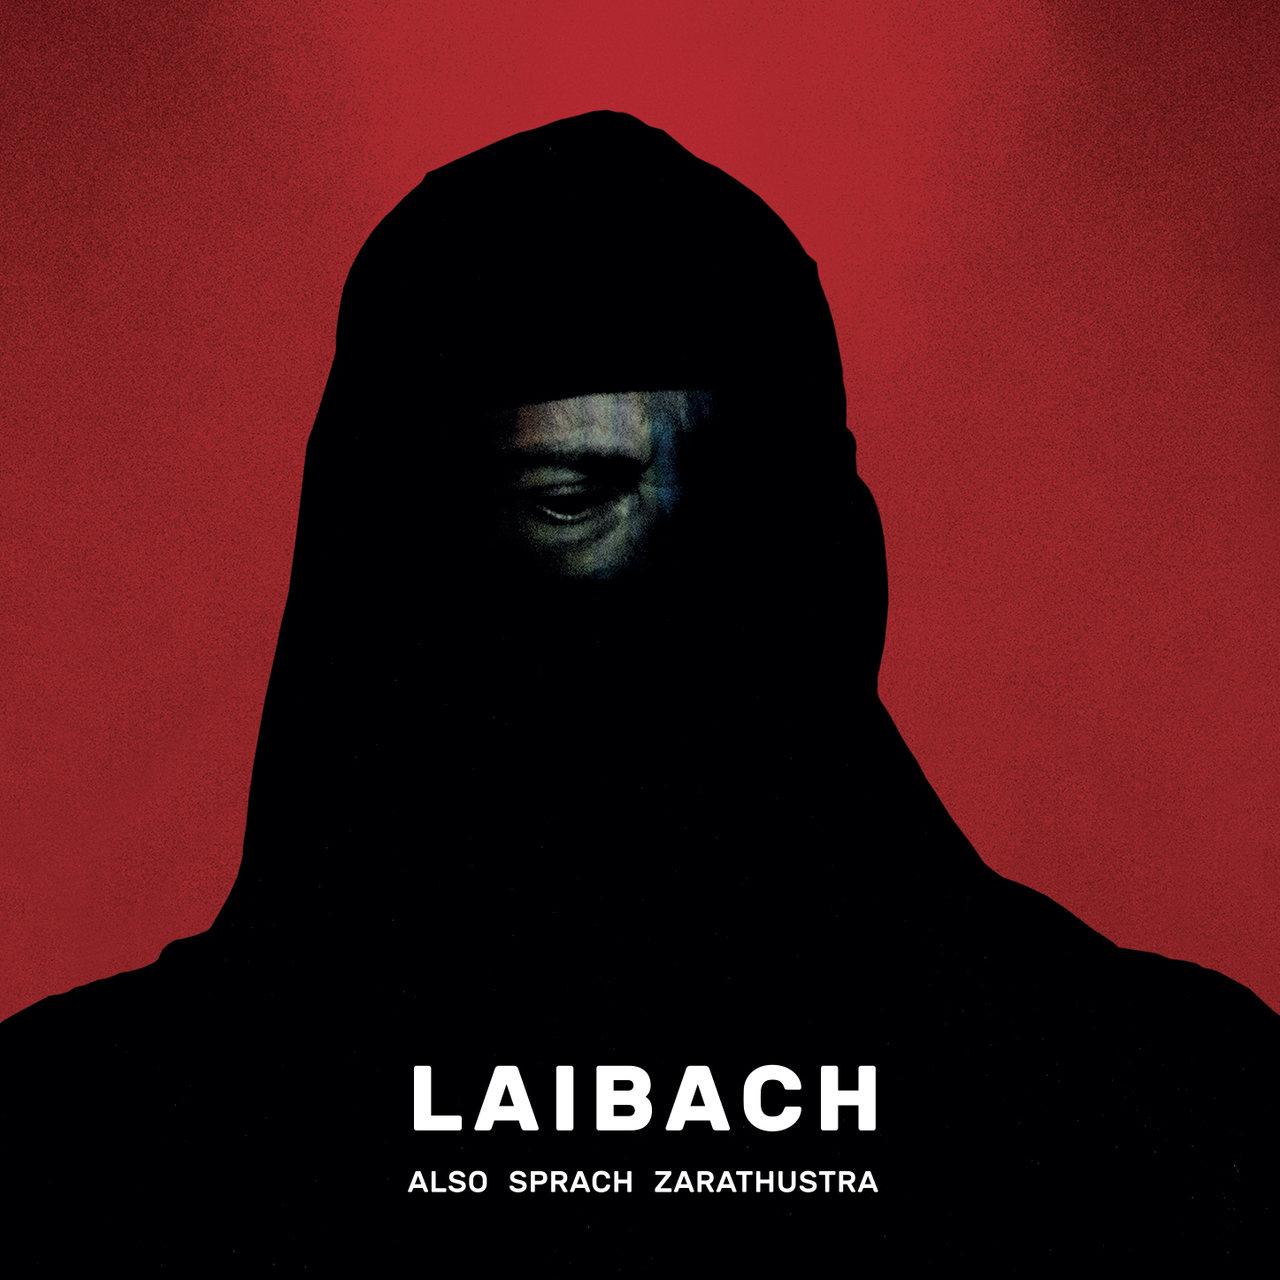 LAIBACH_AlsoSprachZarathustra_cover_Easy-Resize.com_.jpg